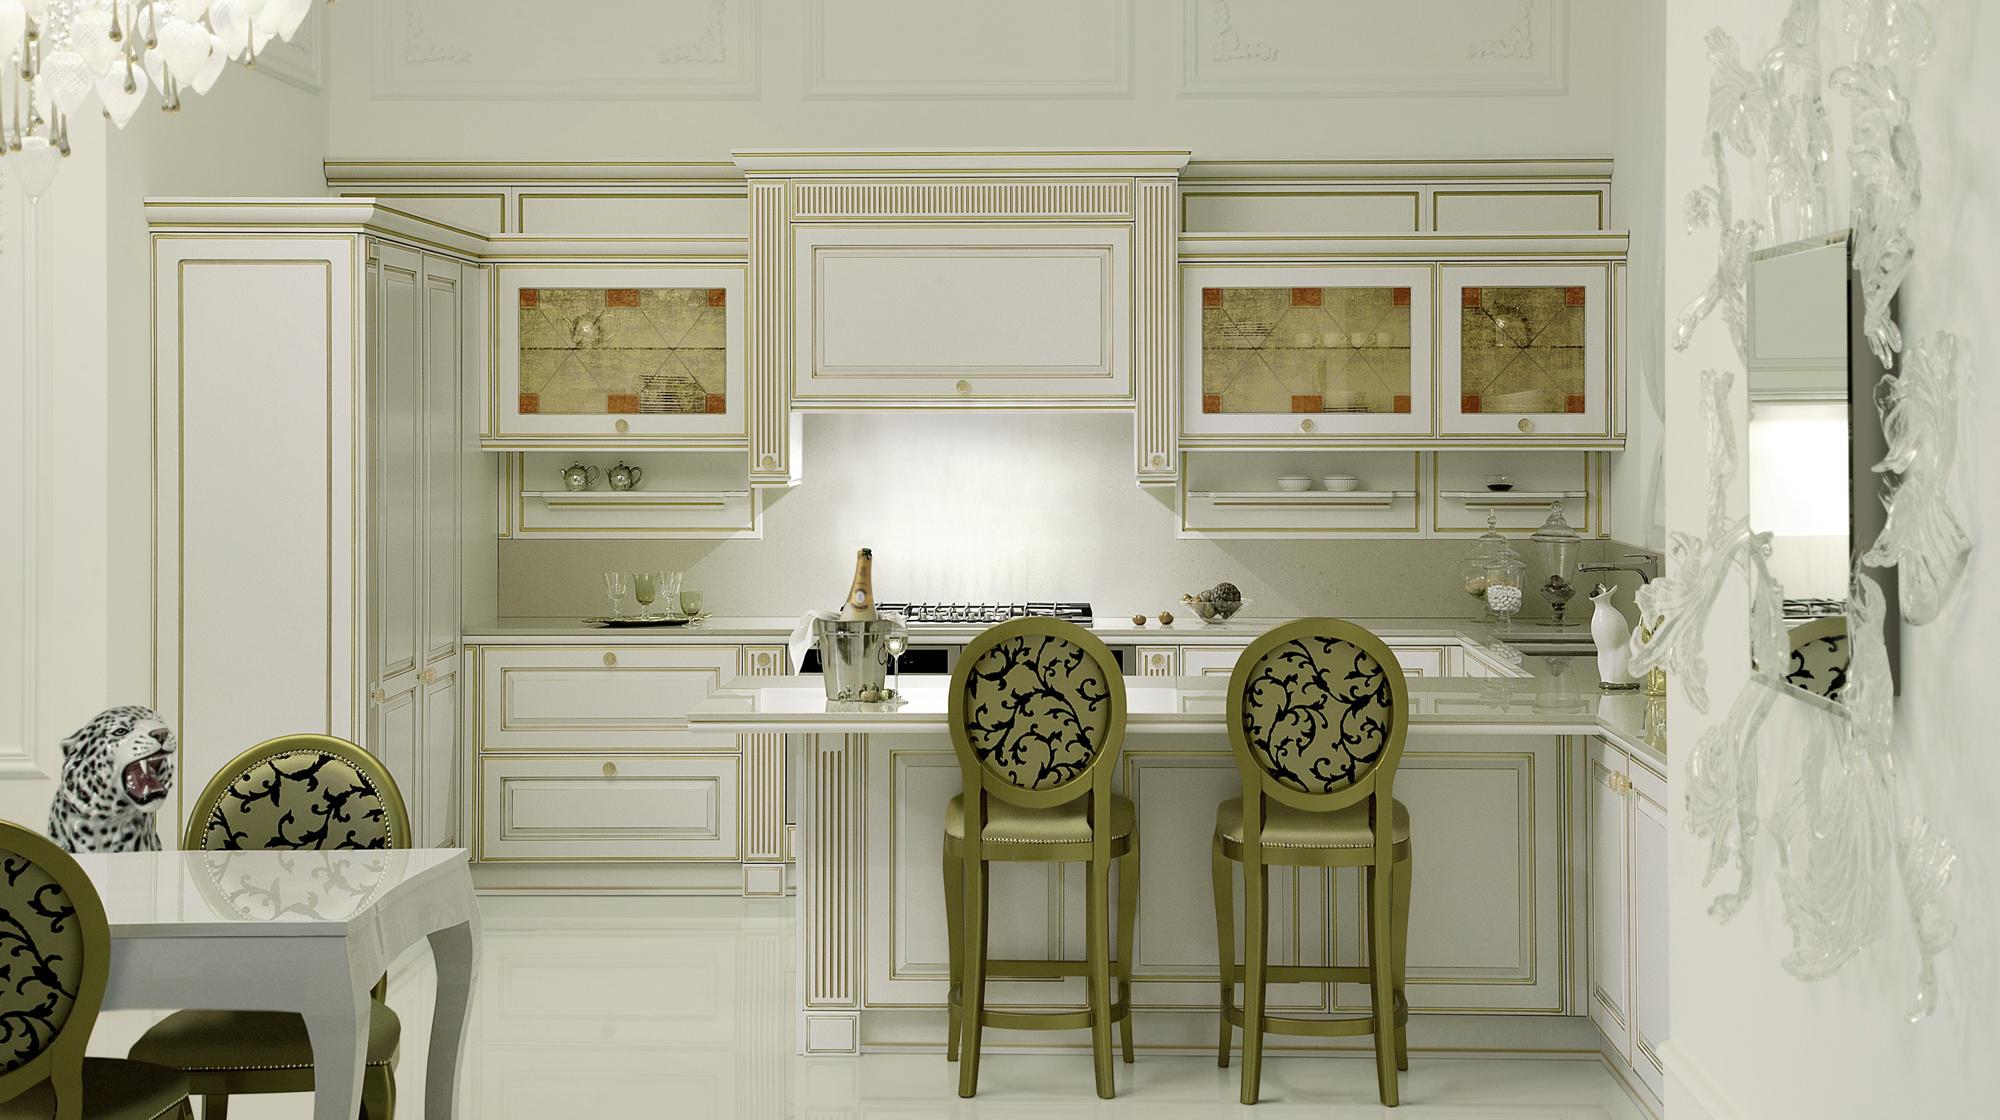 Mirabeau cucine a parete veneta cucine architonic - Veneta cucine gretha ...